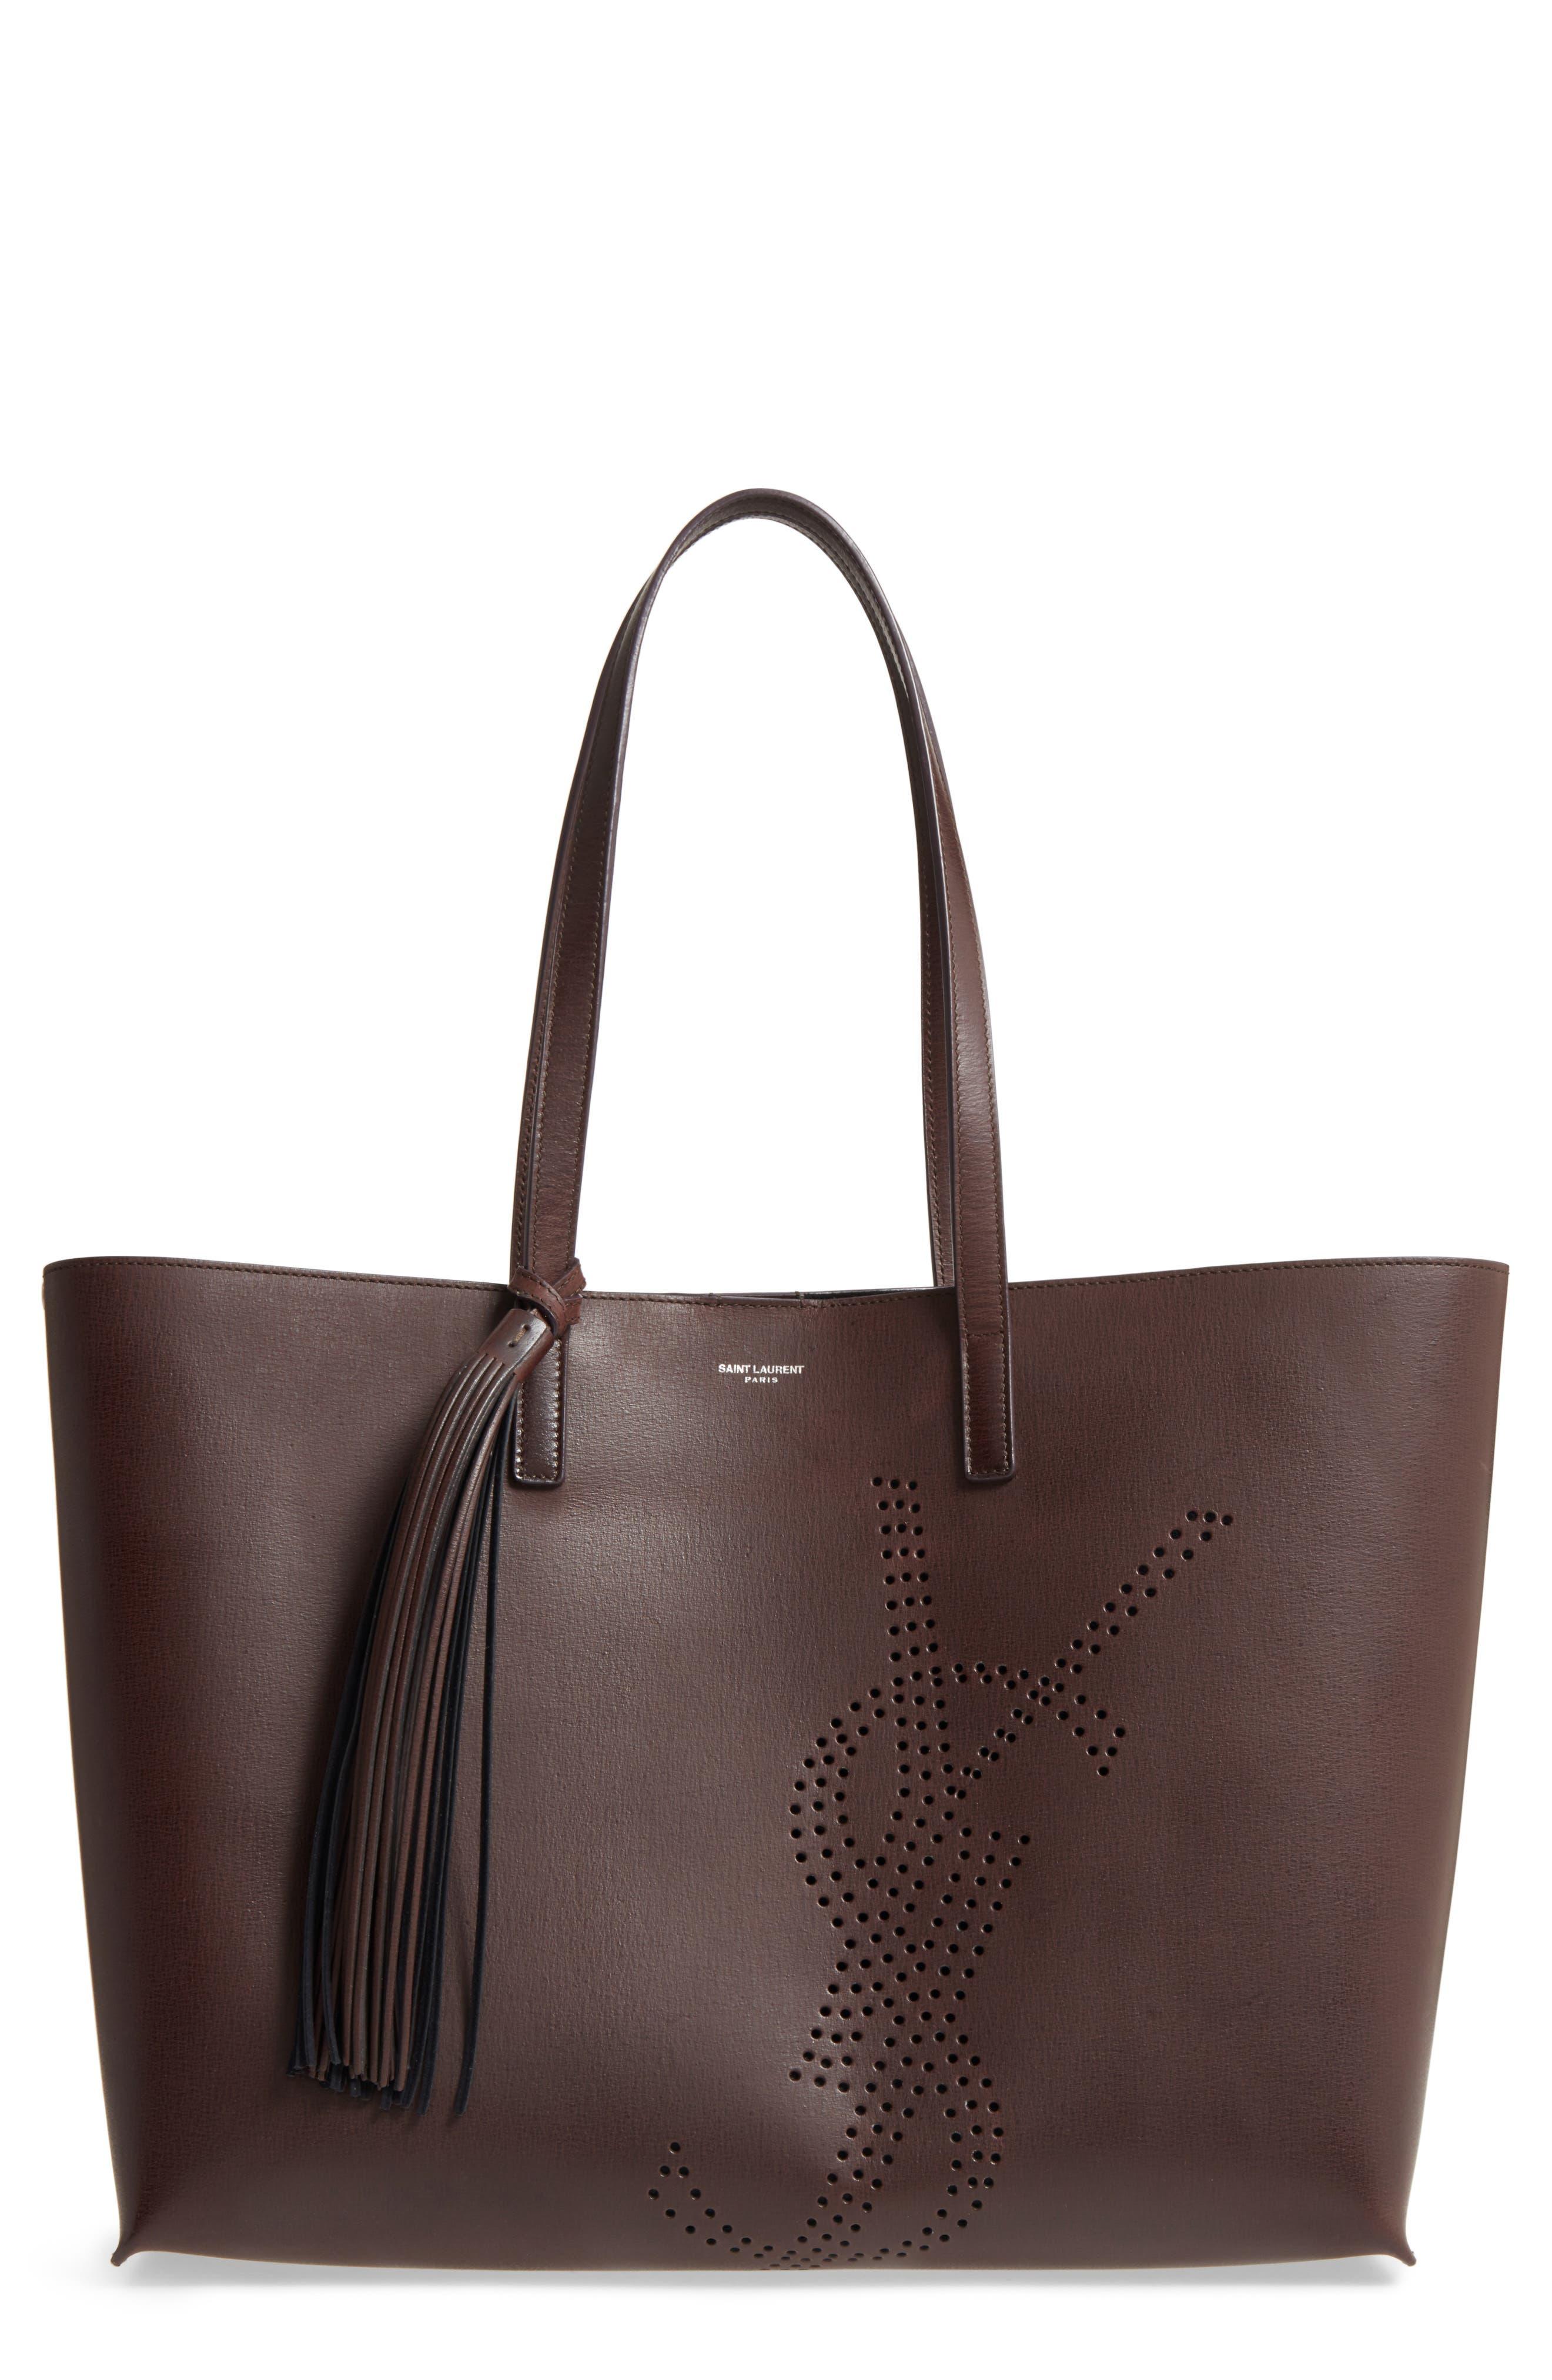 Saint Laurent Perforated Logo Calfskin Leather Shopper